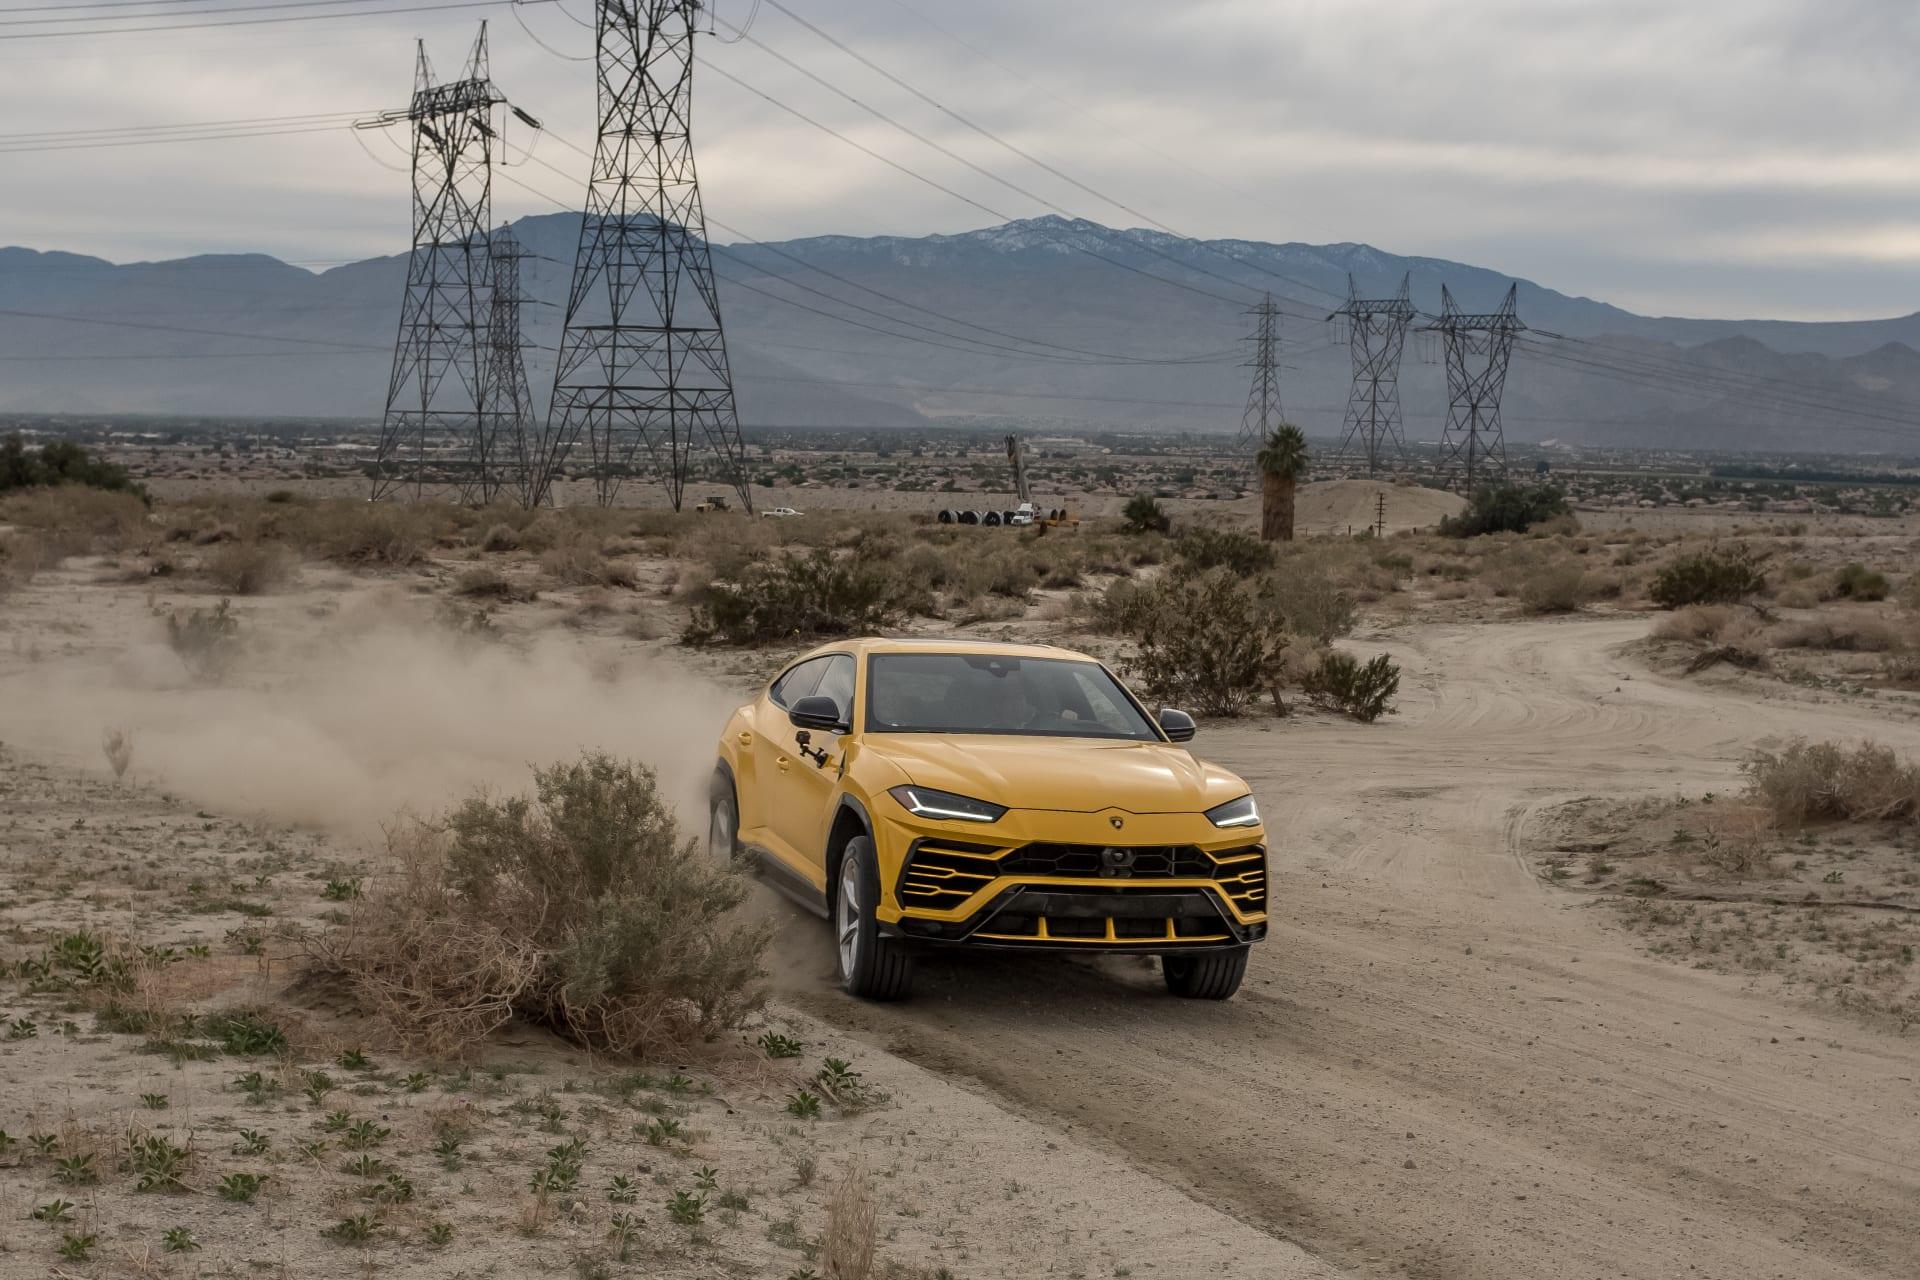 2019 Lamborghini Urus First Drive: Supercar Cattle-Prodding